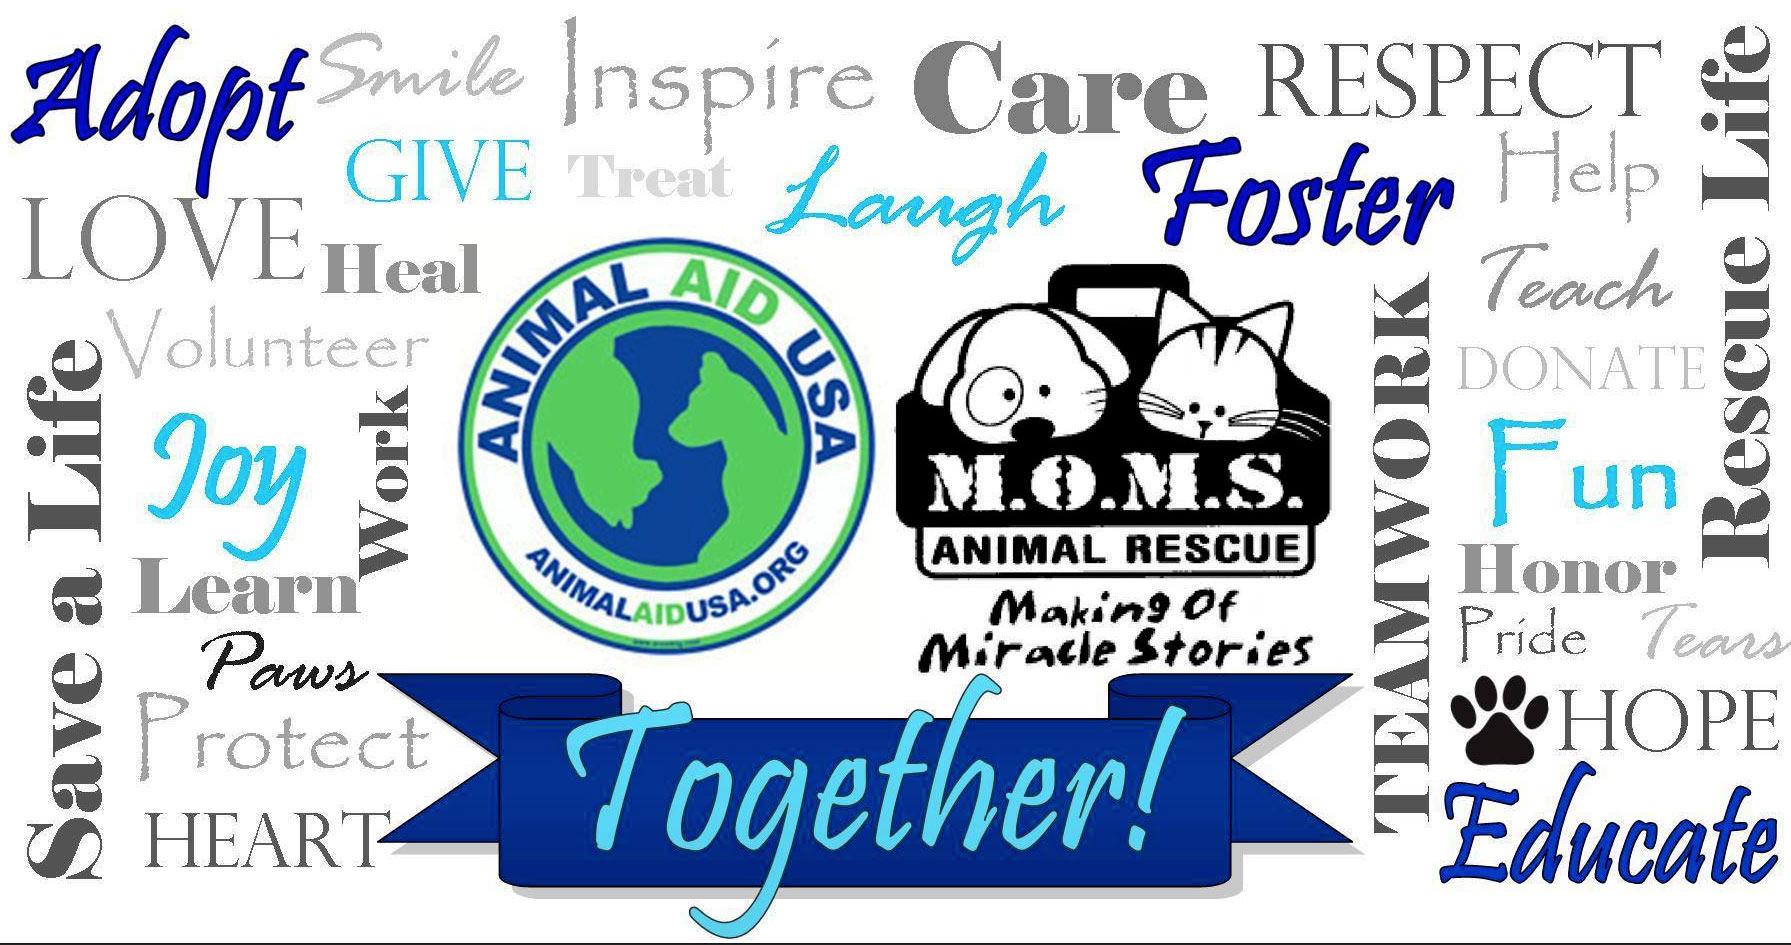 MOMS Partner With Animal Aid USA